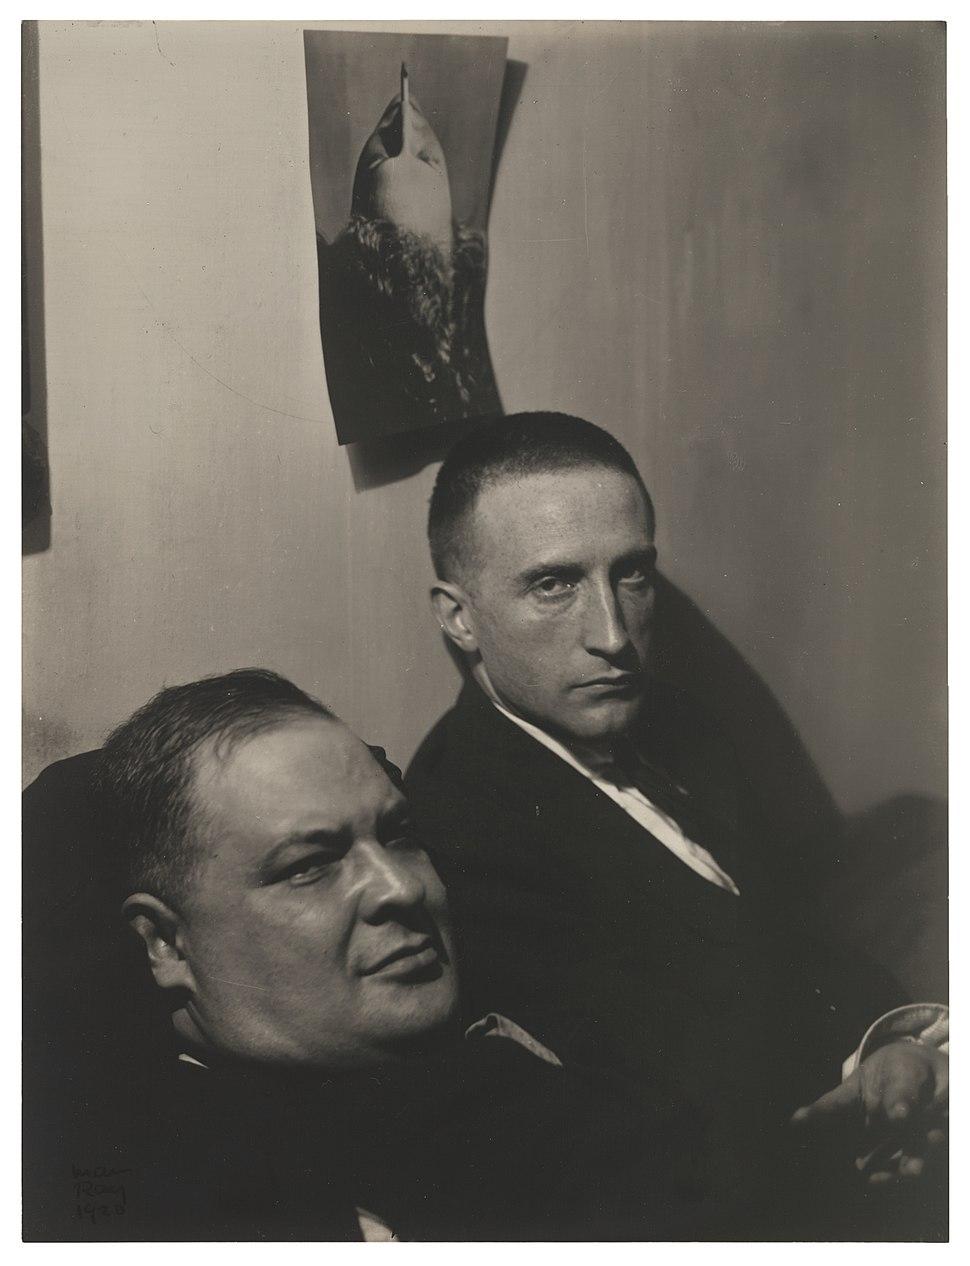 Man Ray, 1920, Three Heads (Joseph Stella and Marcel Duchamp), gelatin silver print, 20.7 x 15.7 cm, Museum of Modern Art